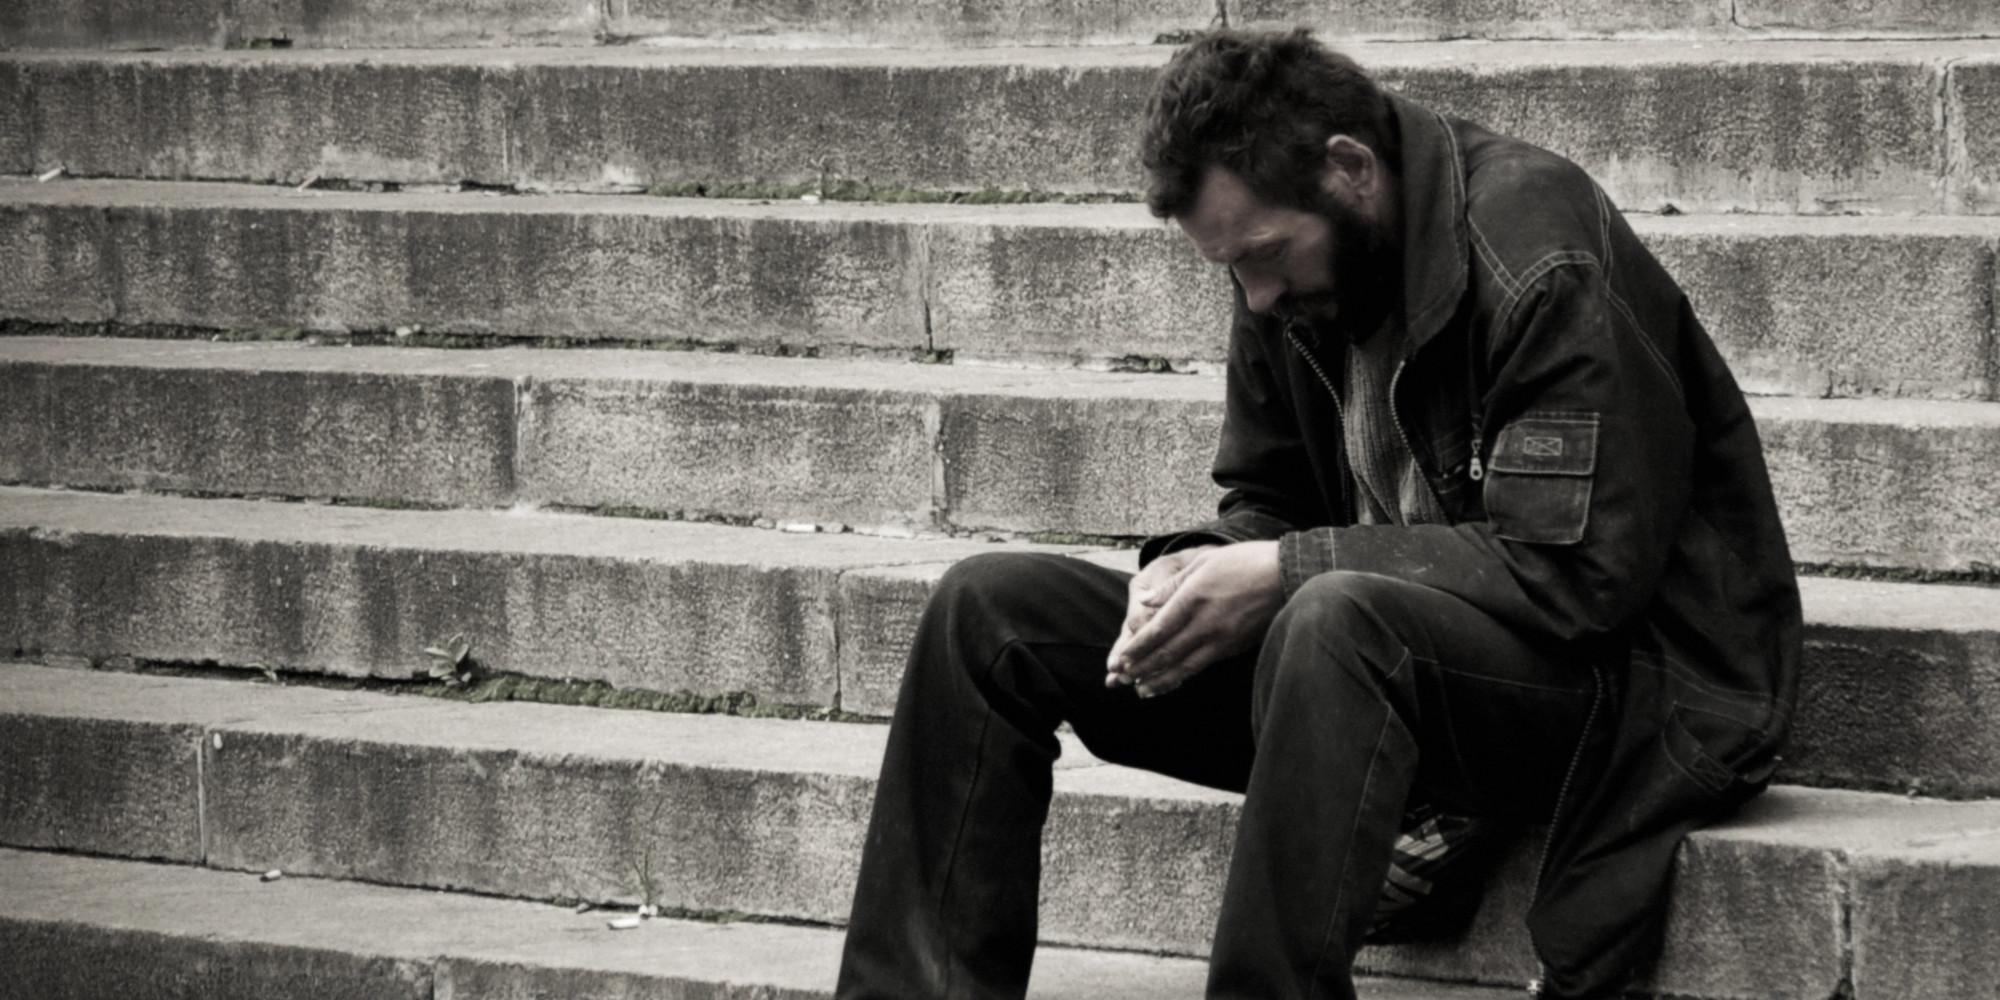 o-homeless-man-sad-facebook